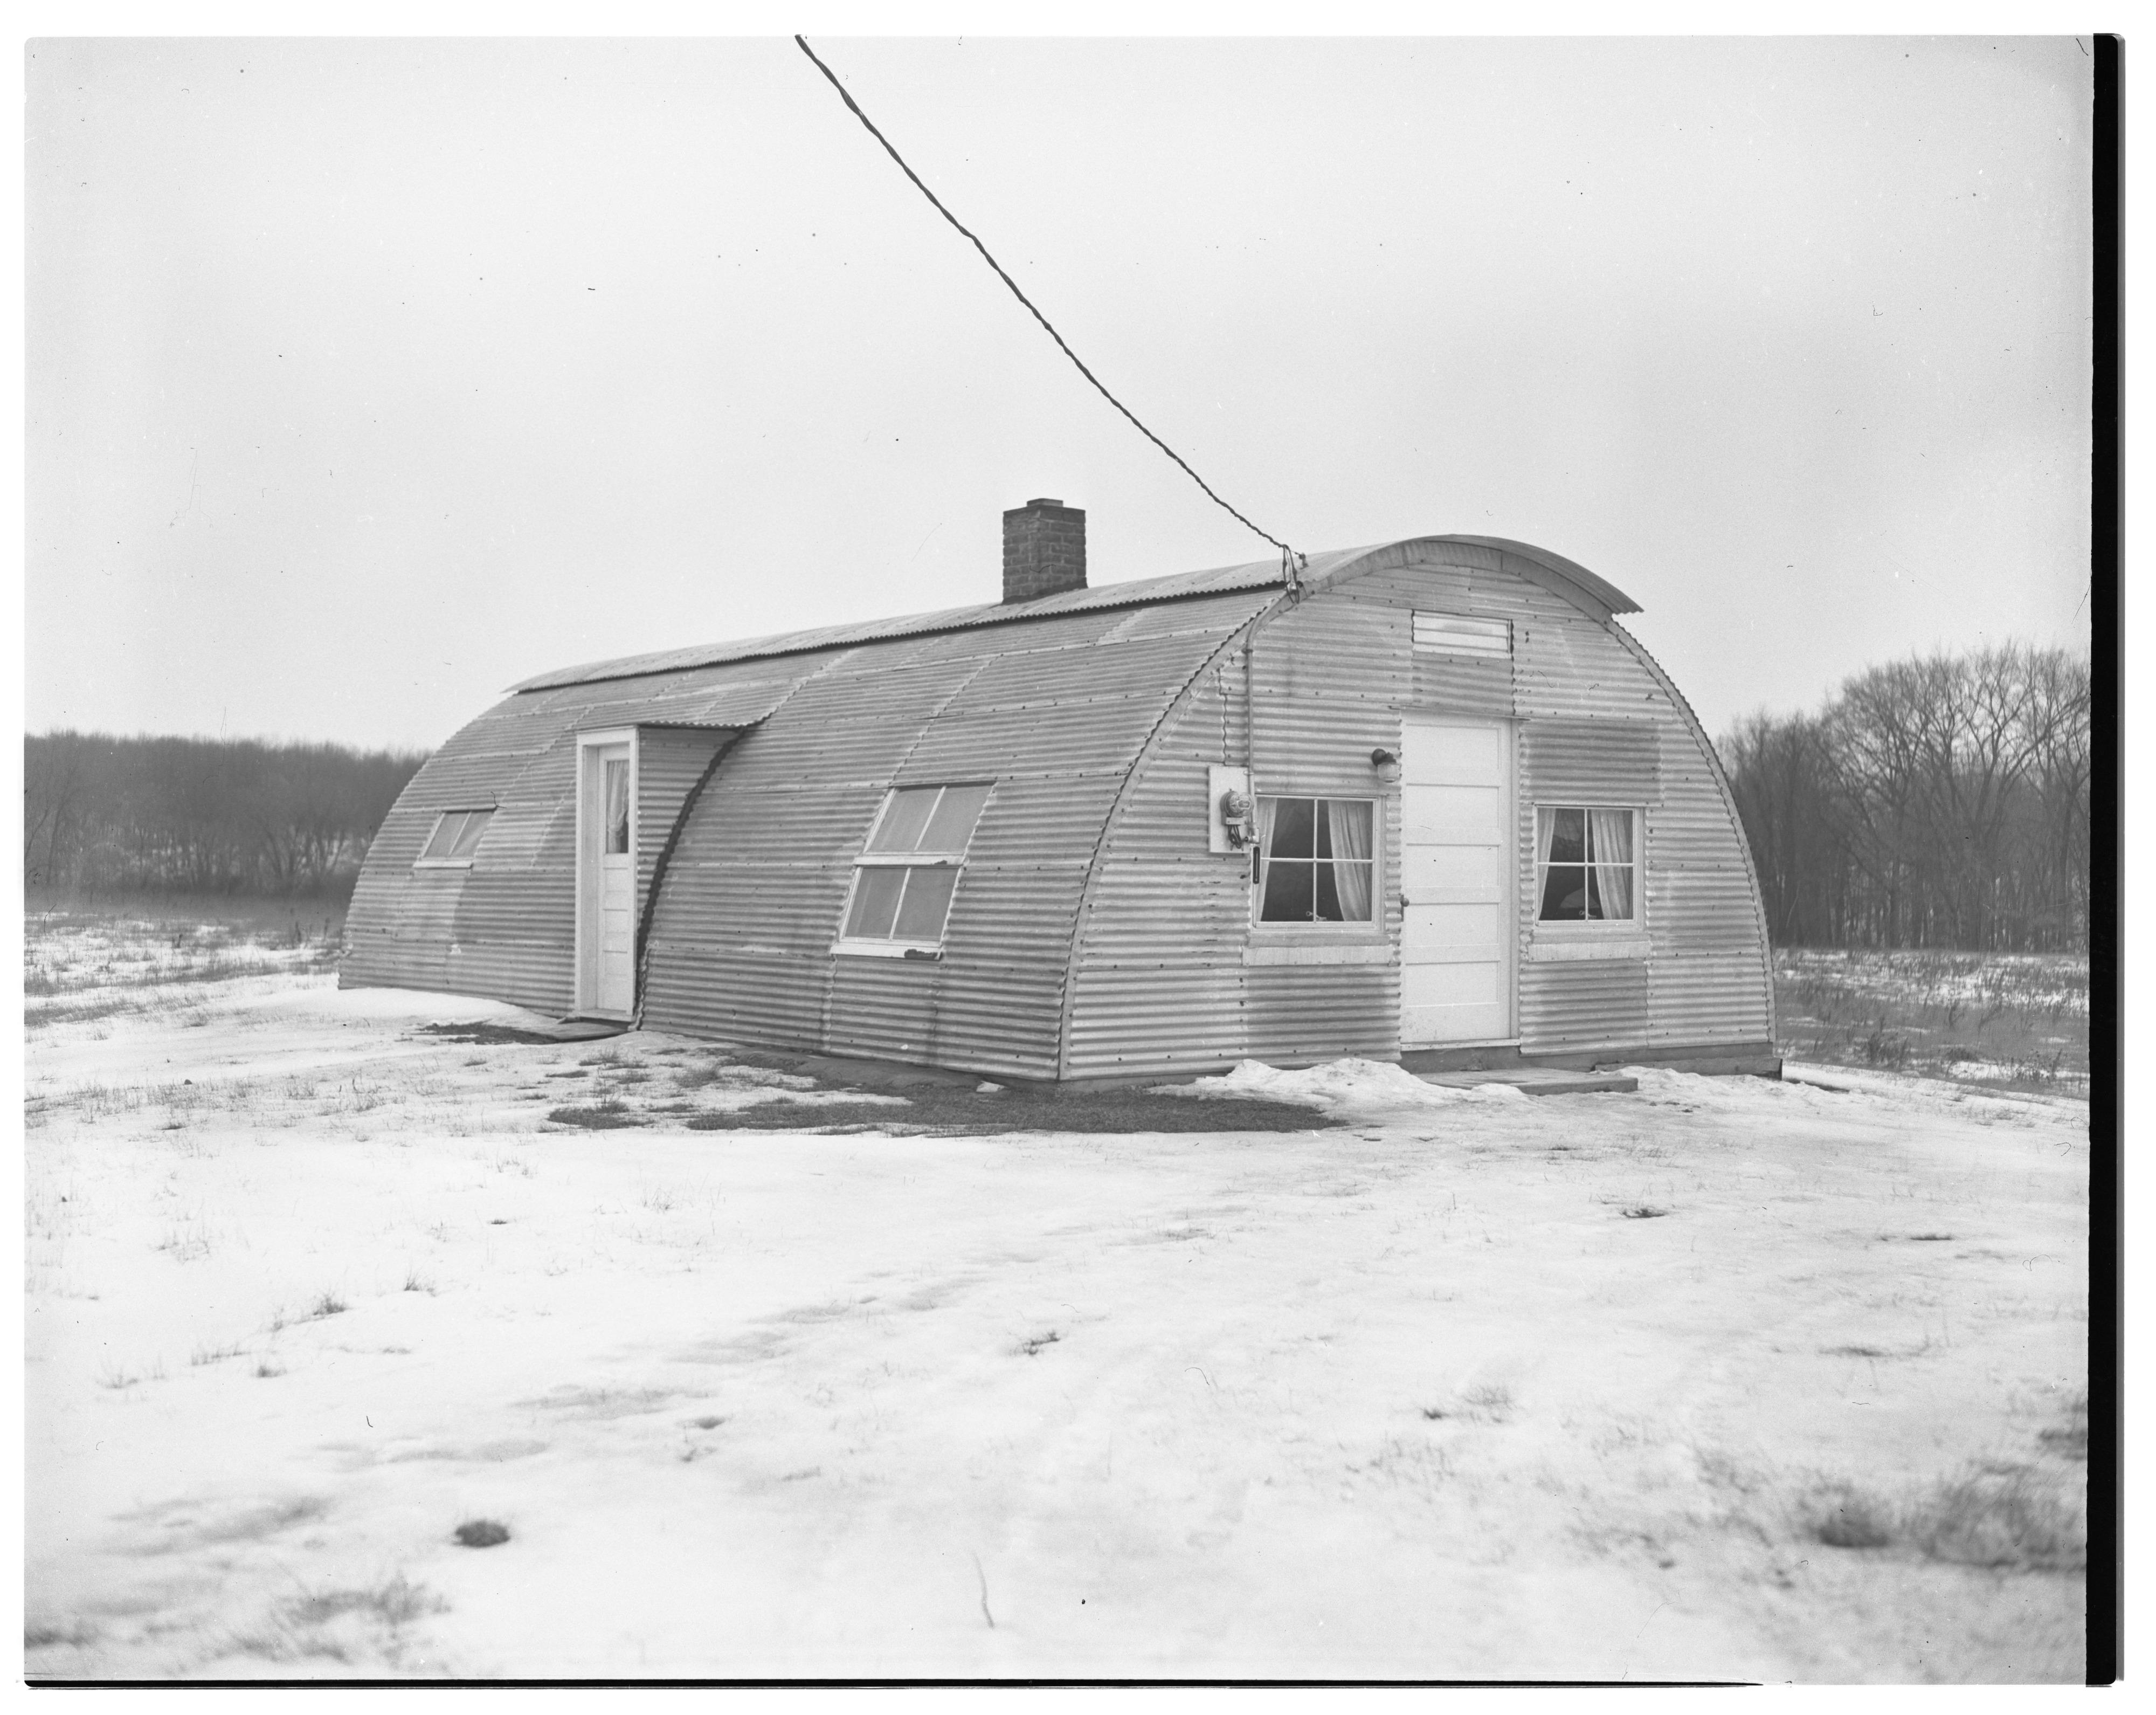 Fullsize Of Quonset Hut Homes